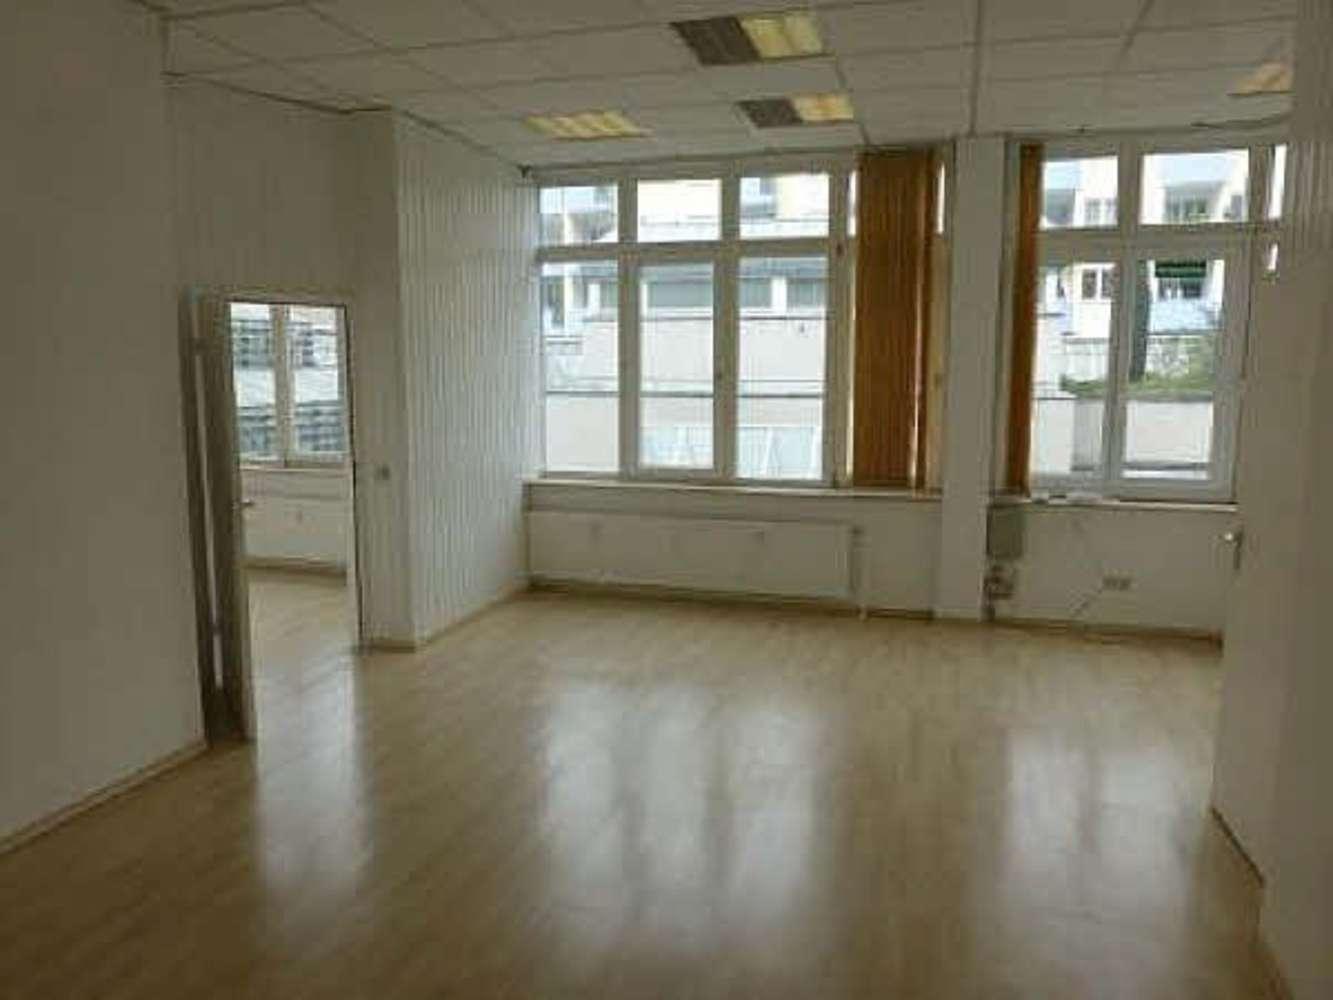 Büros Frankfurt am main, 60486 - Büro - Frankfurt am Main, Bockenheim - F1919 - 9502331